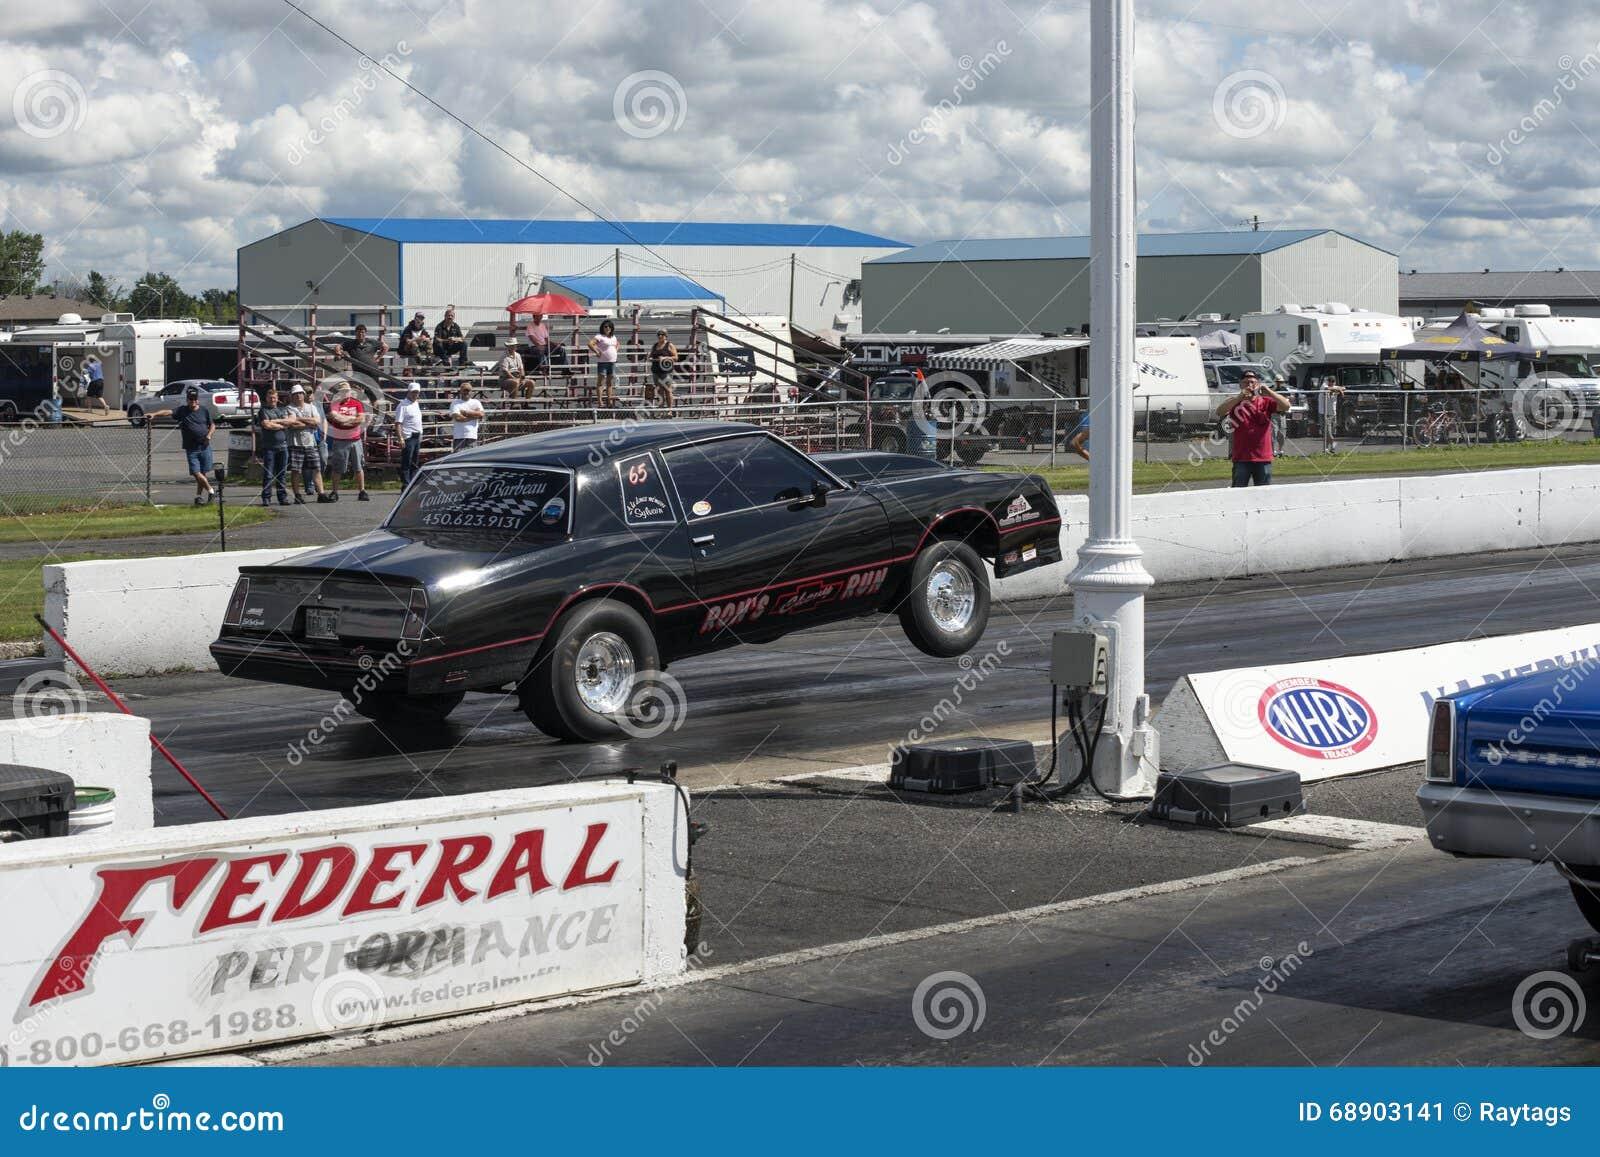 Monte carlo wheelie editorial photo. Image of racer, power - 68903141